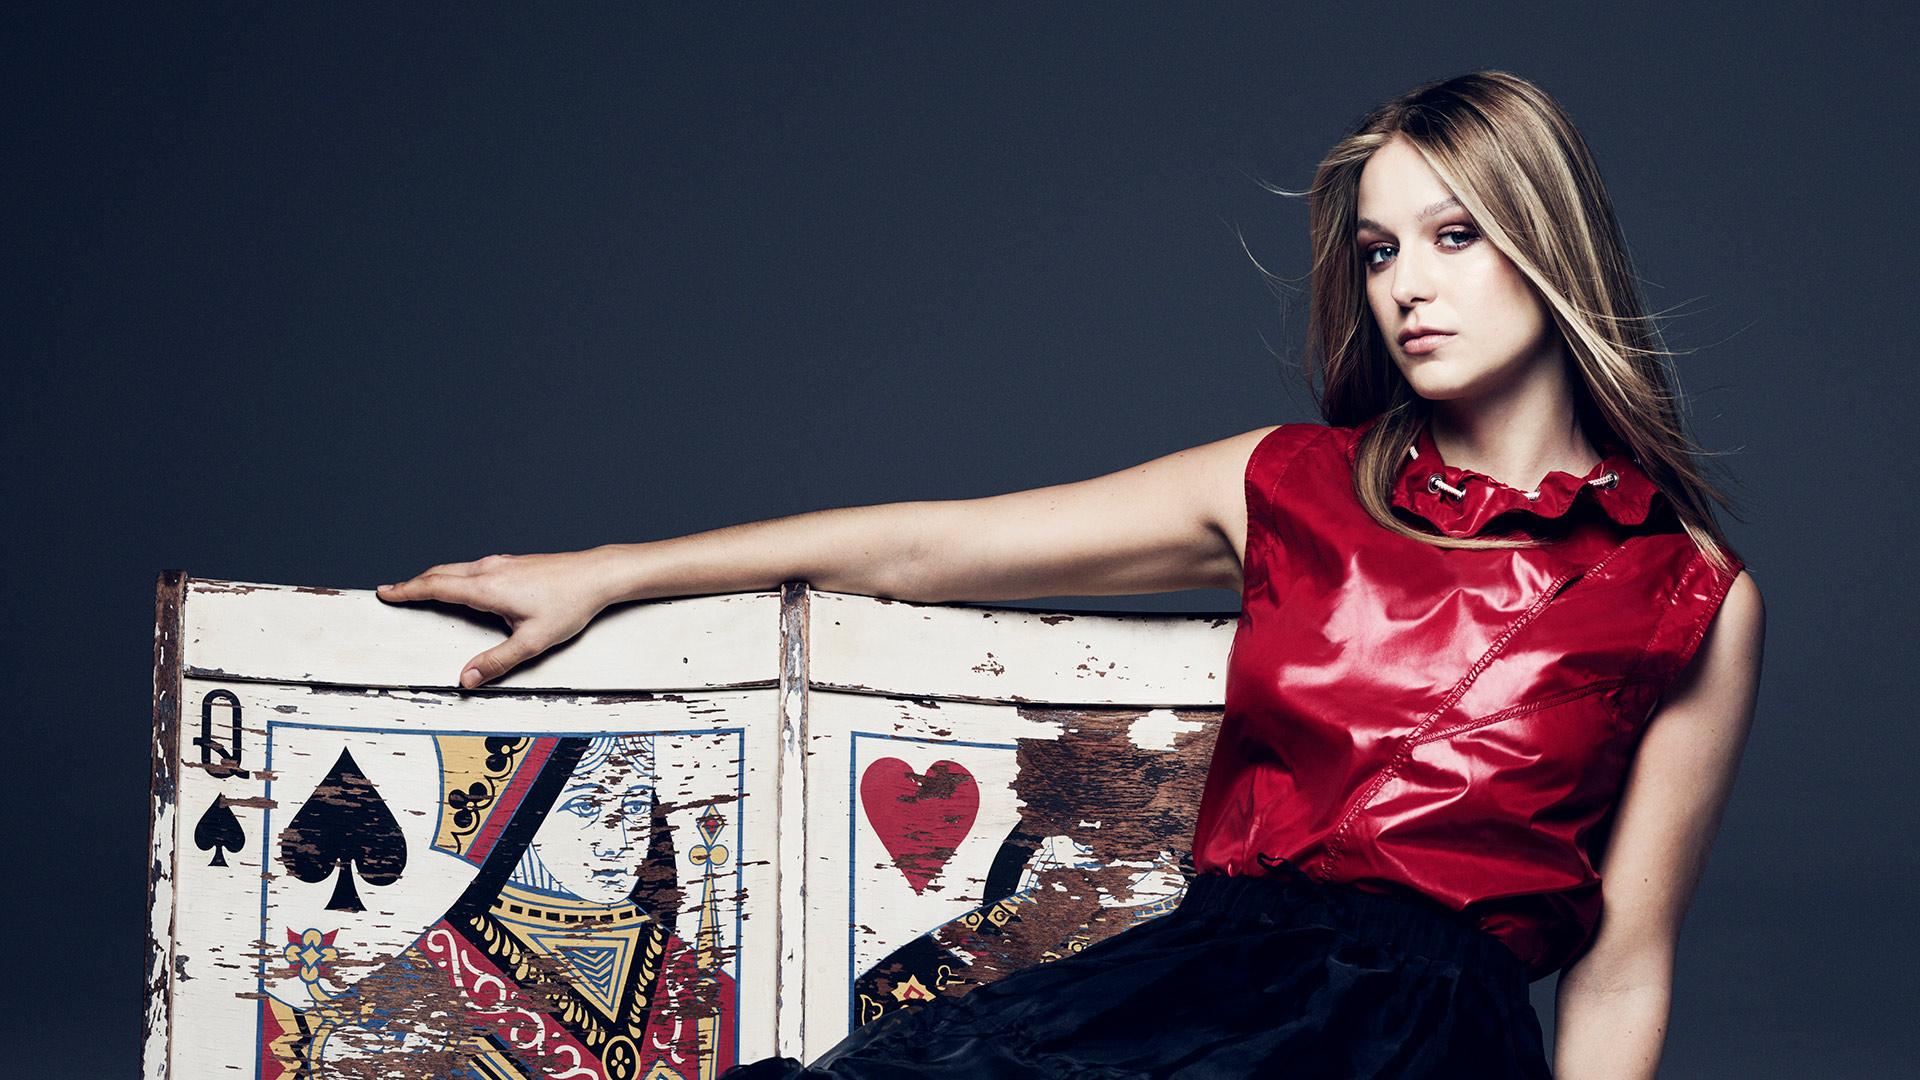 21 Beautiful Fashion Photos Of Supergirl Star Melissa Benoist Watch Magazine Photos Cbs Com